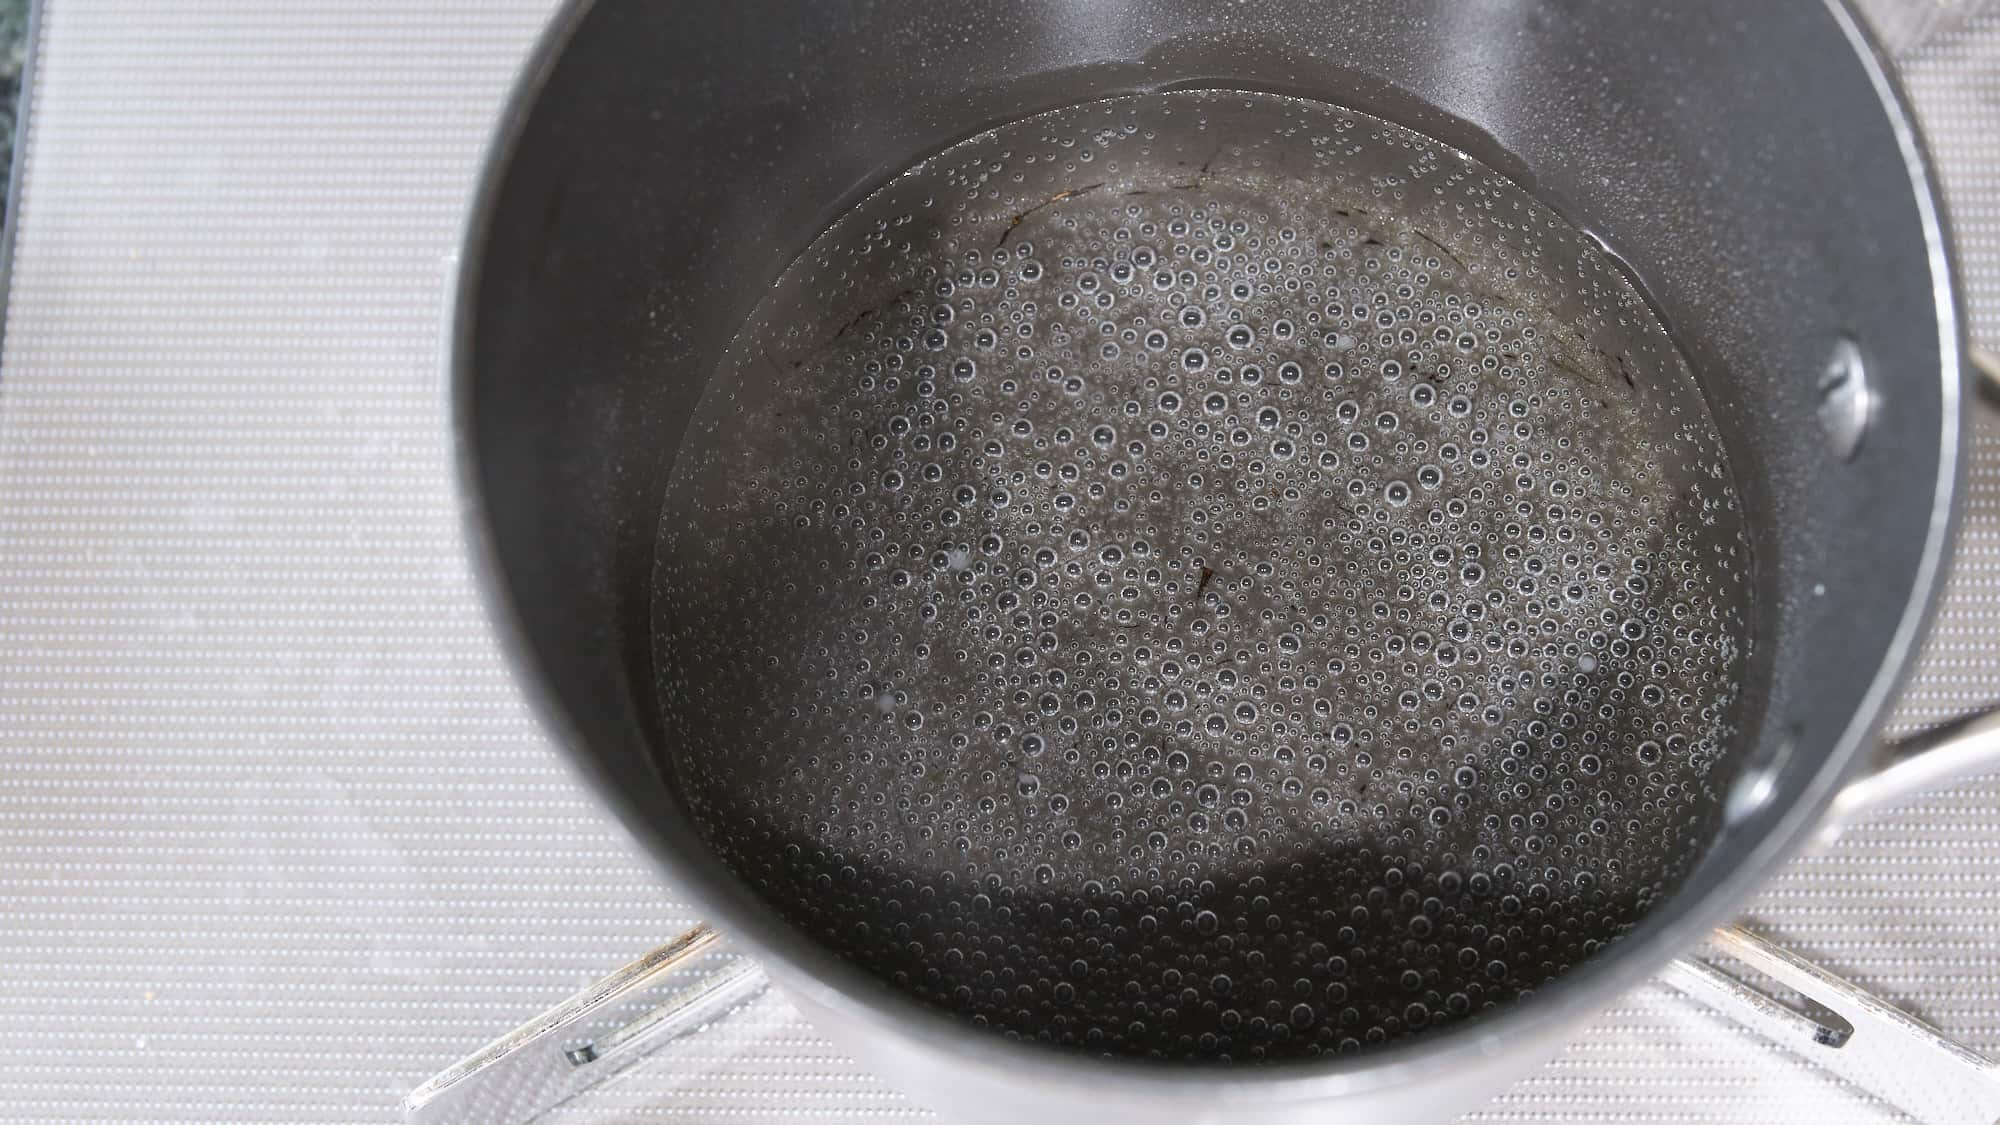 Brine for ramen egg in pot on stove.